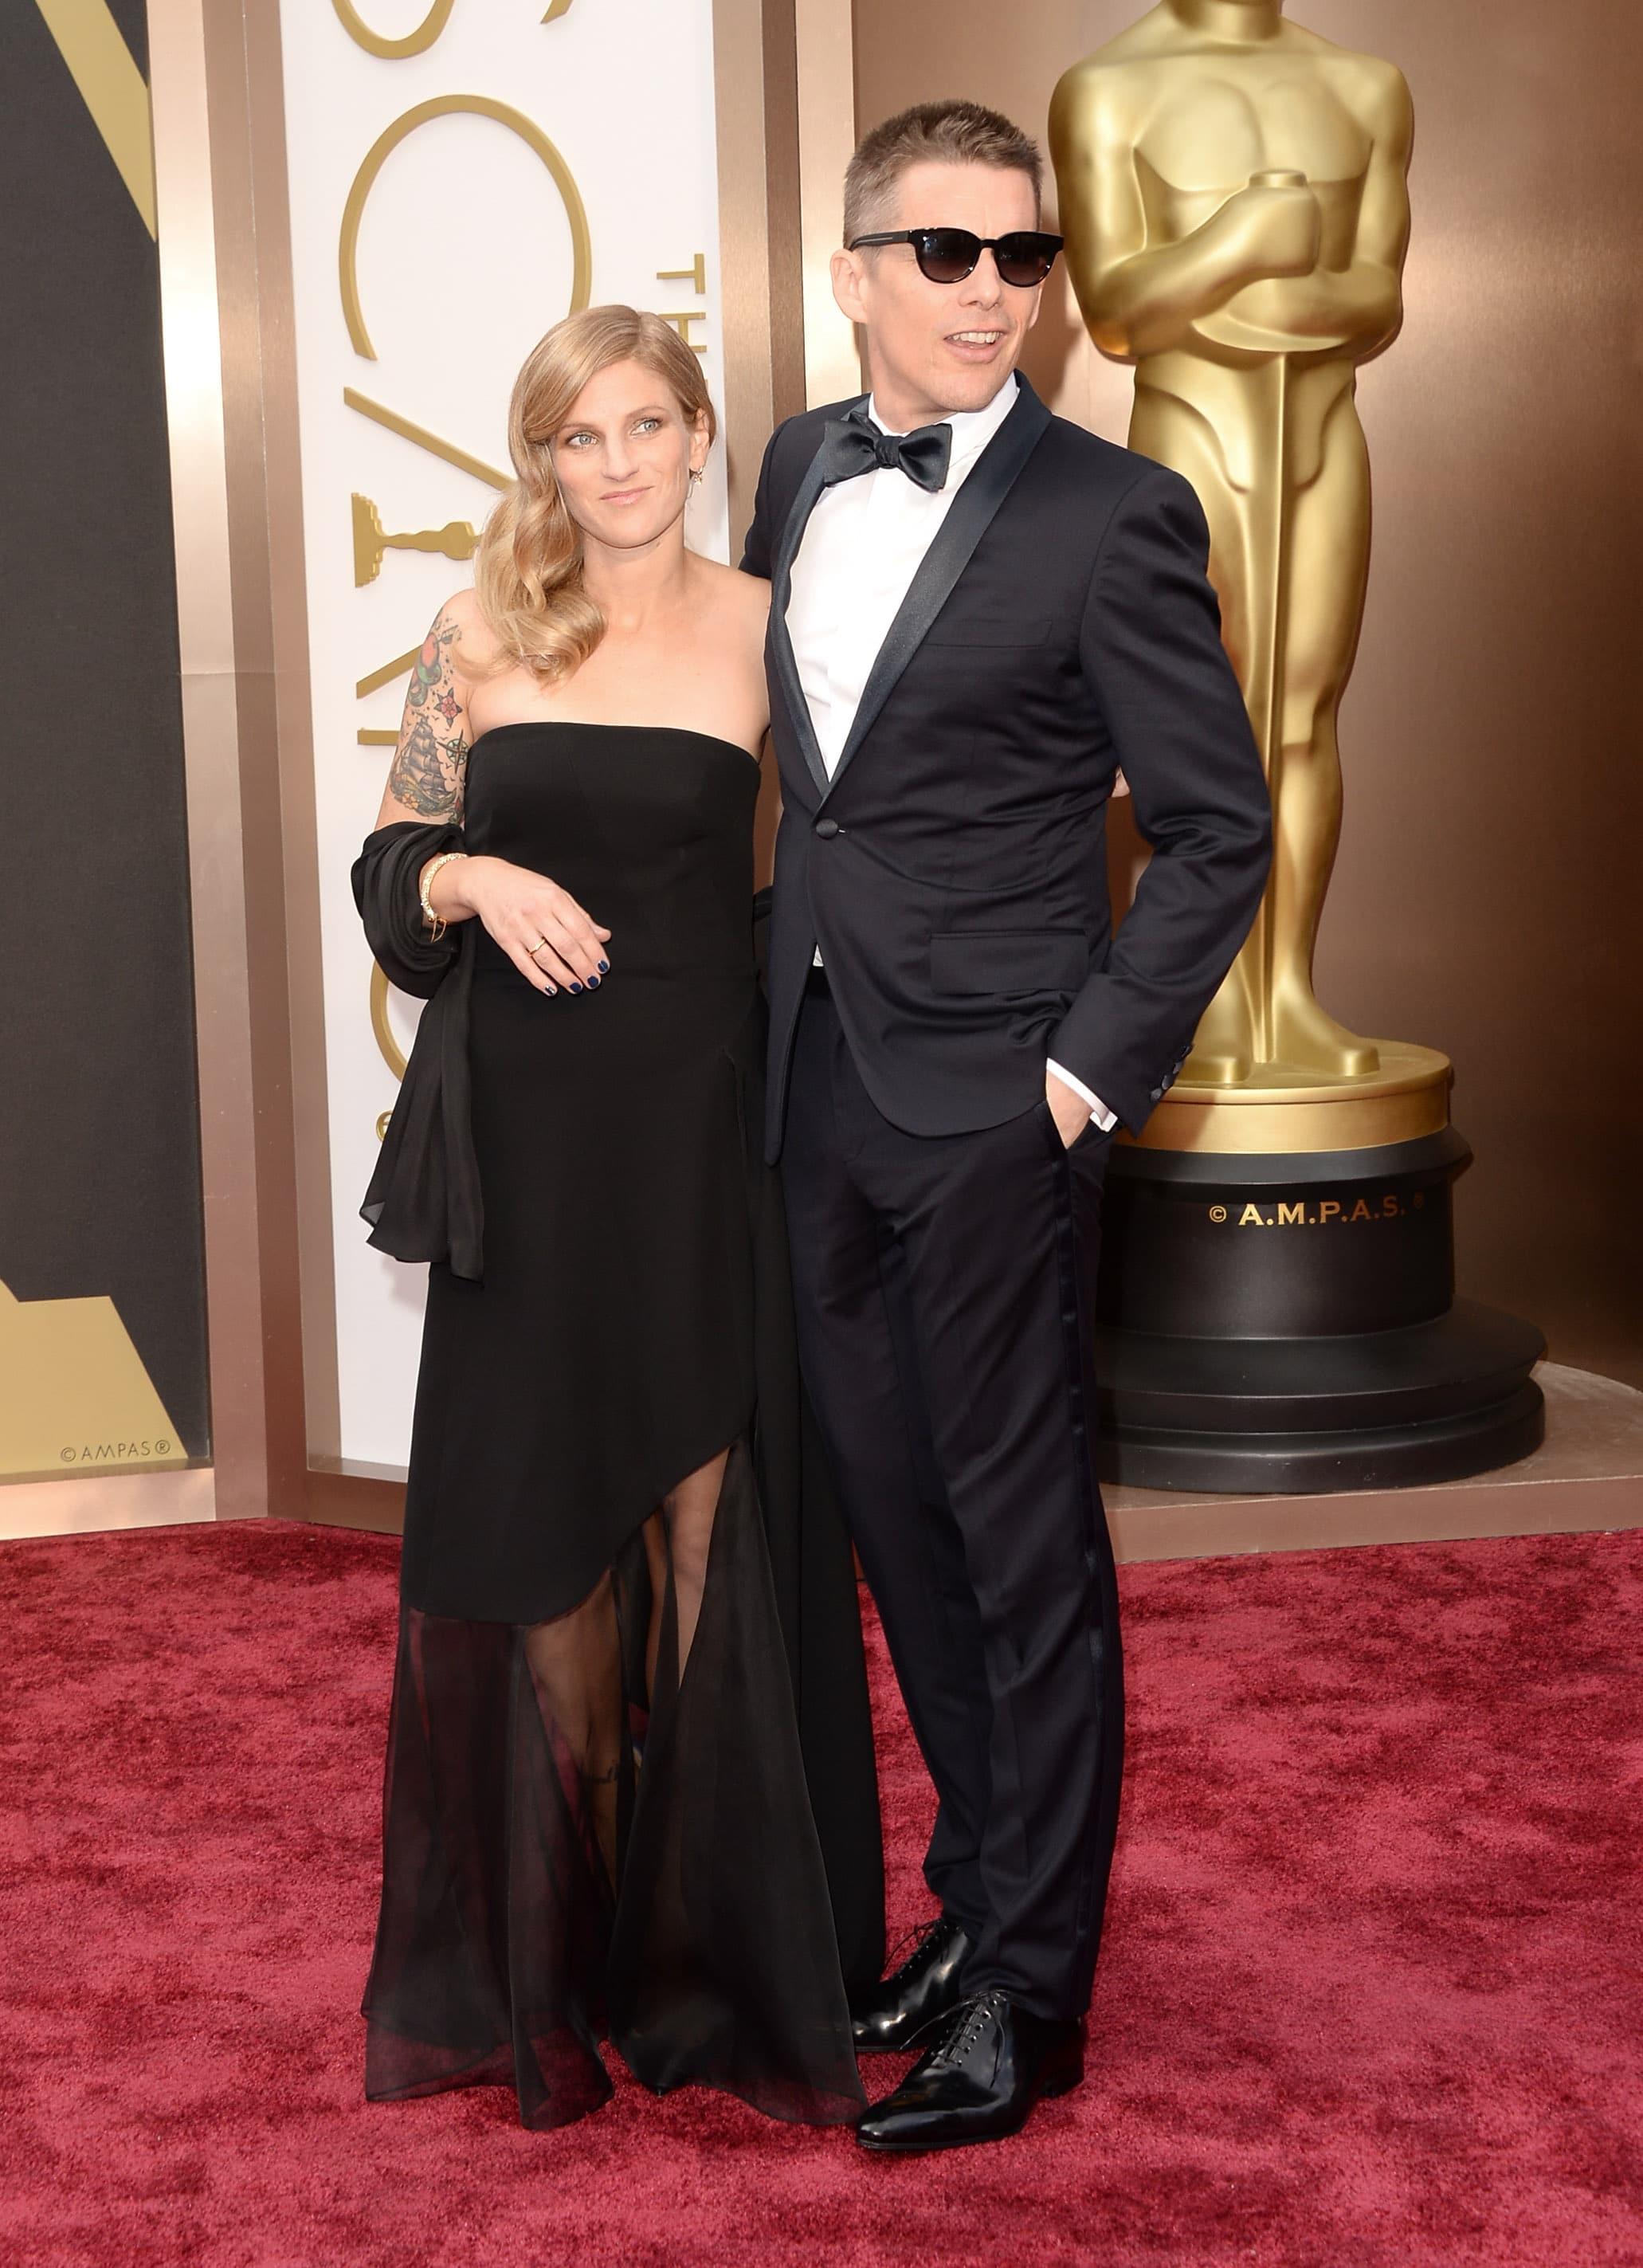 Who's Ethan Hawke's wife Ryan Hawke? Bio: Age, Height, Net ...